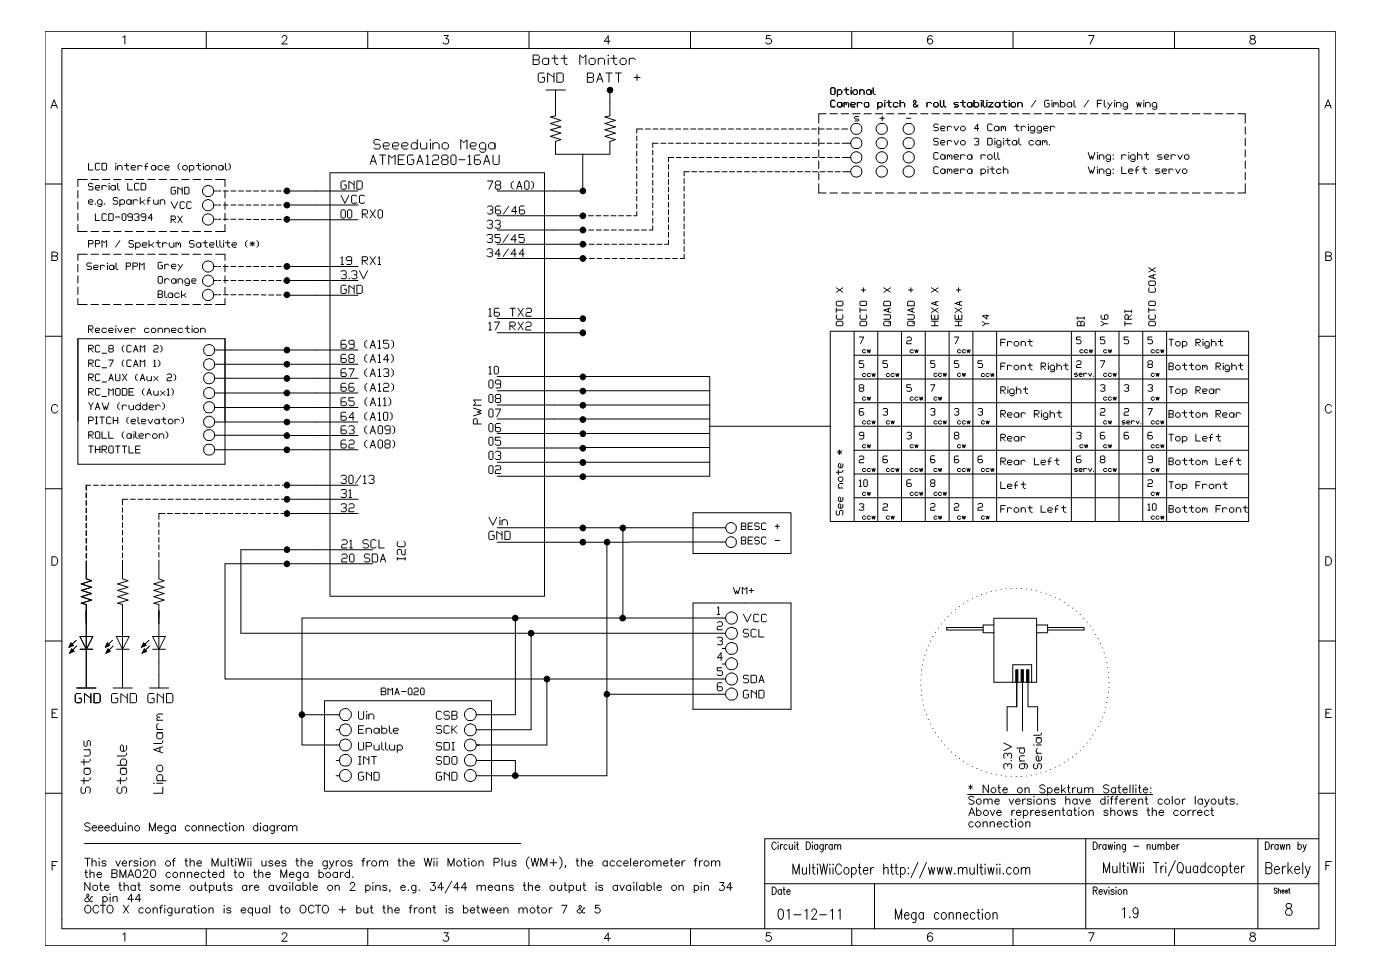 multiwii wiring diagram wiring diagram center multiwii wiring diagram [ 1380 x 976 Pixel ]